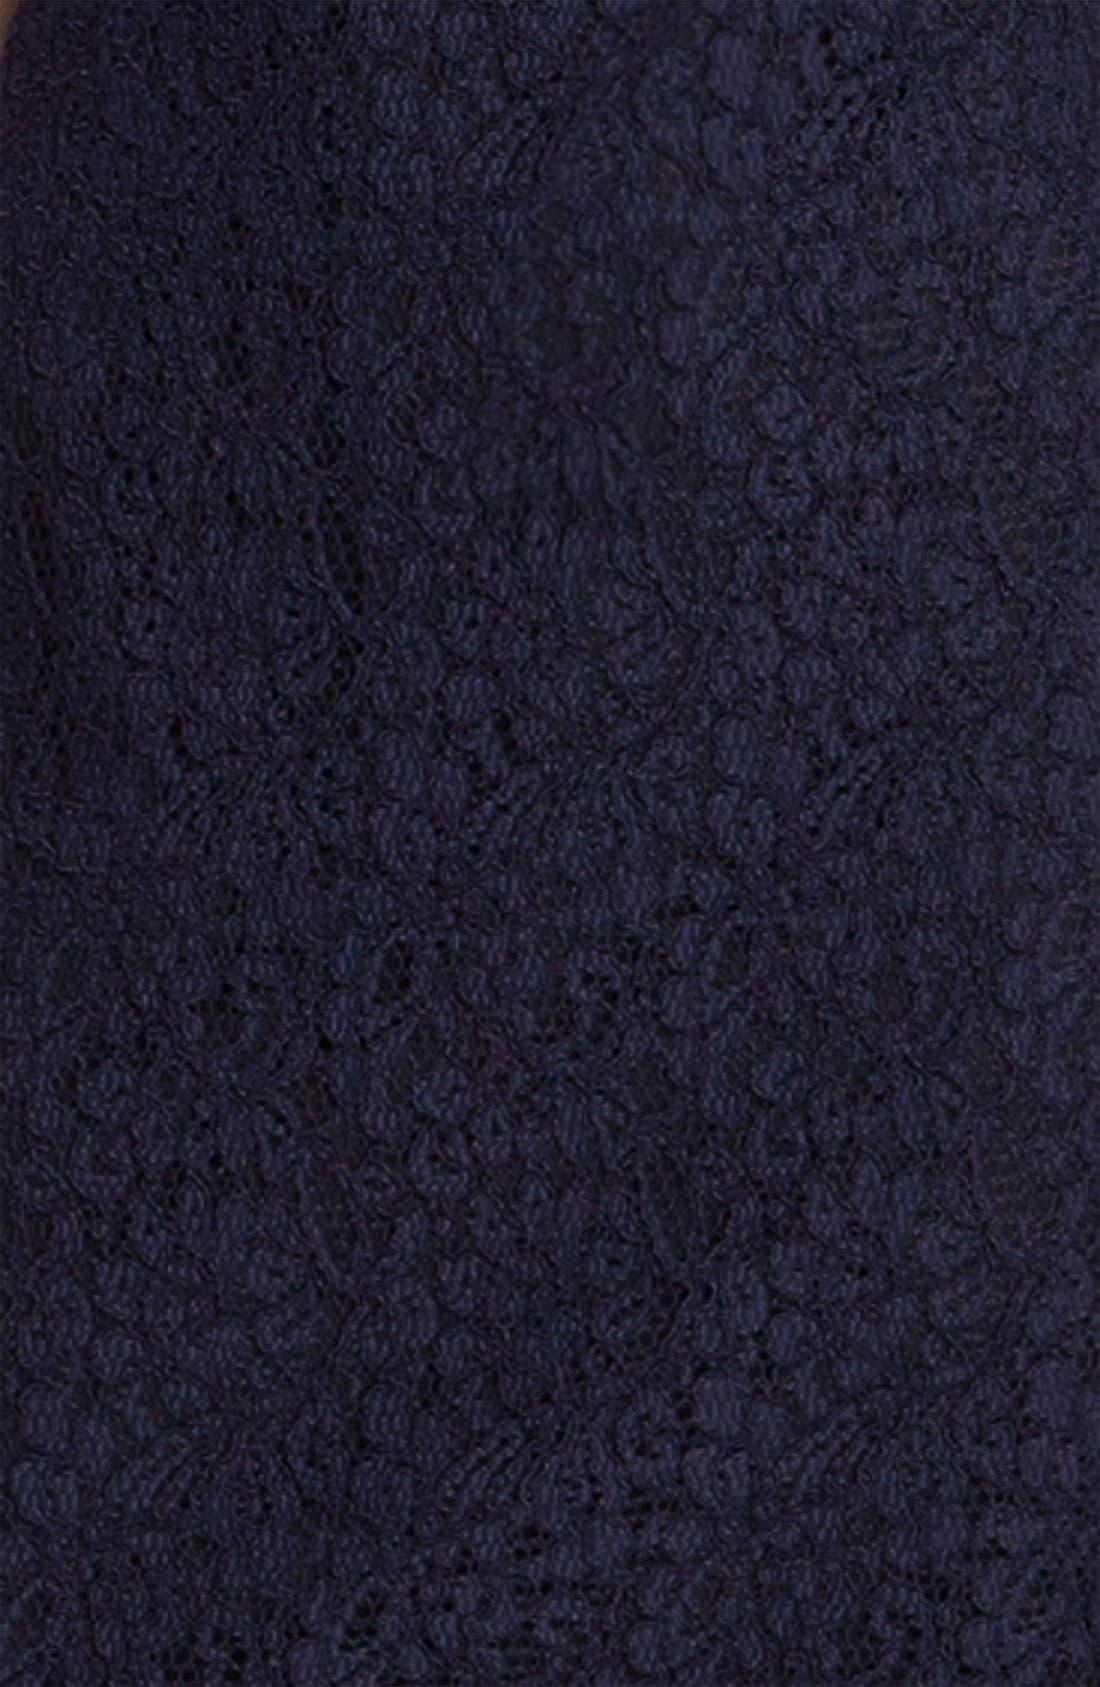 Boatneck Lace Sheath Dress,                             Alternate thumbnail 106, color,